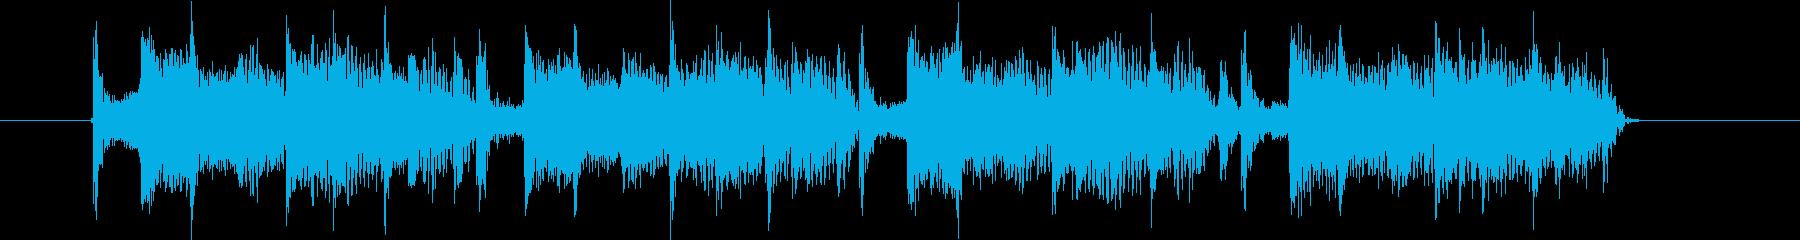 Hip-hop track jingles's reproduced waveform